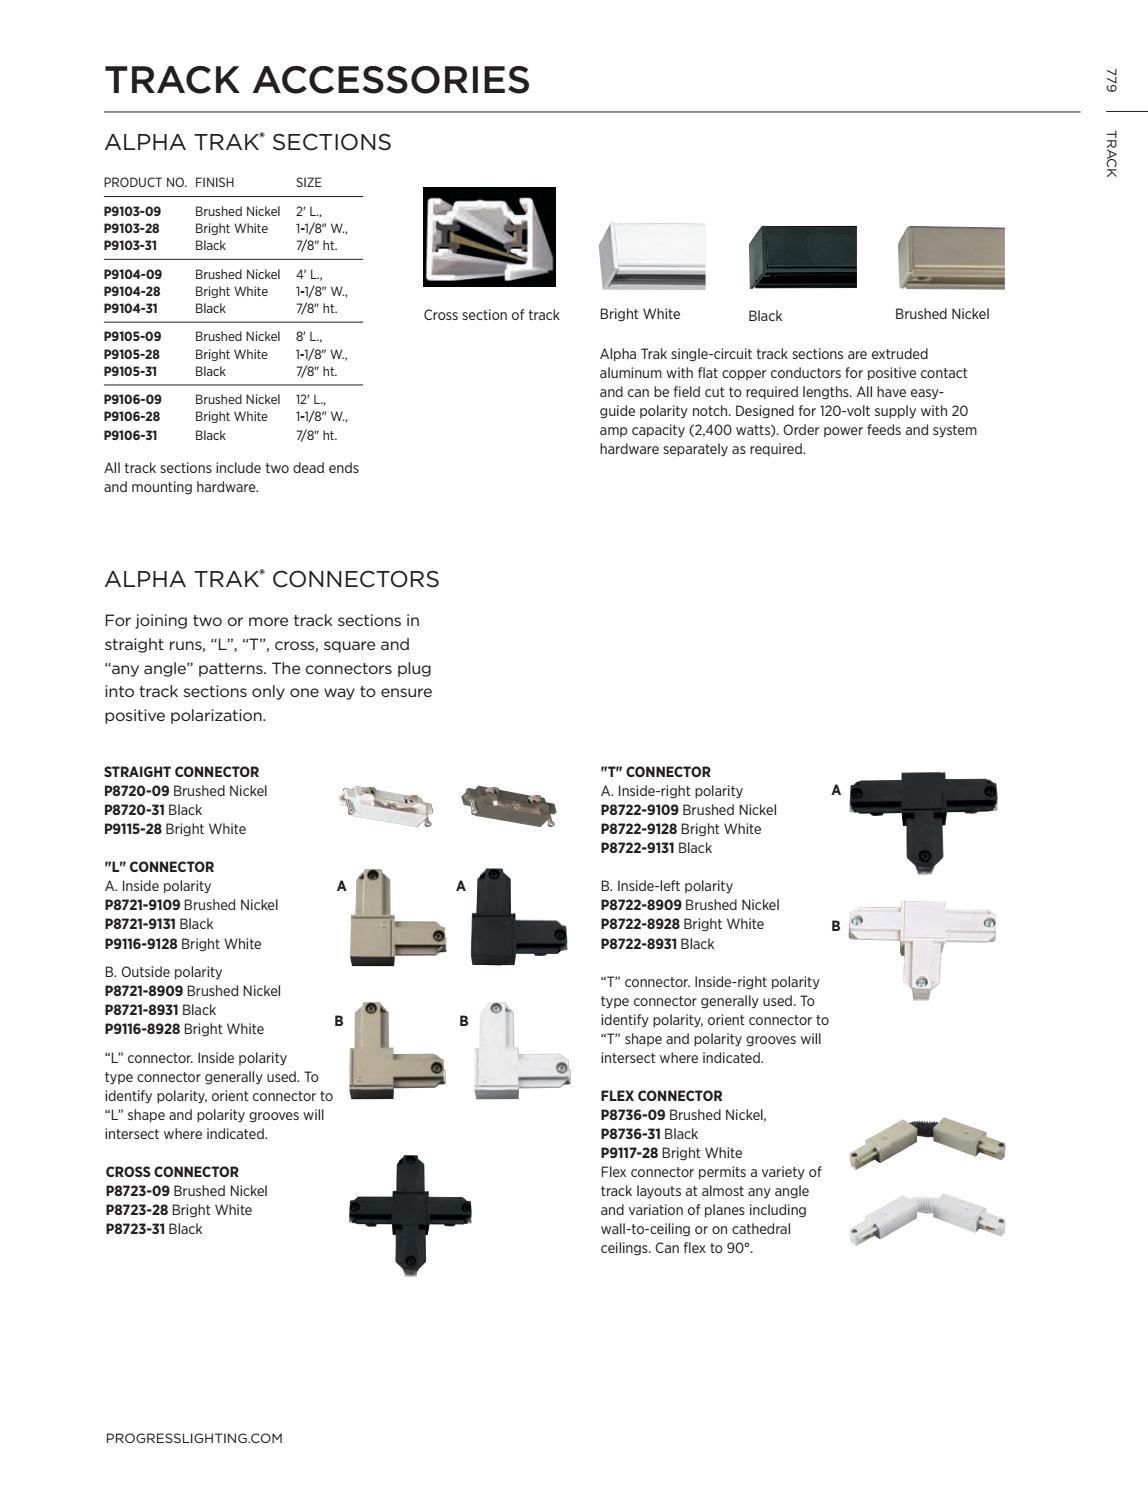 Black Progress Lighting P9105-31 Alpha Trak Sections